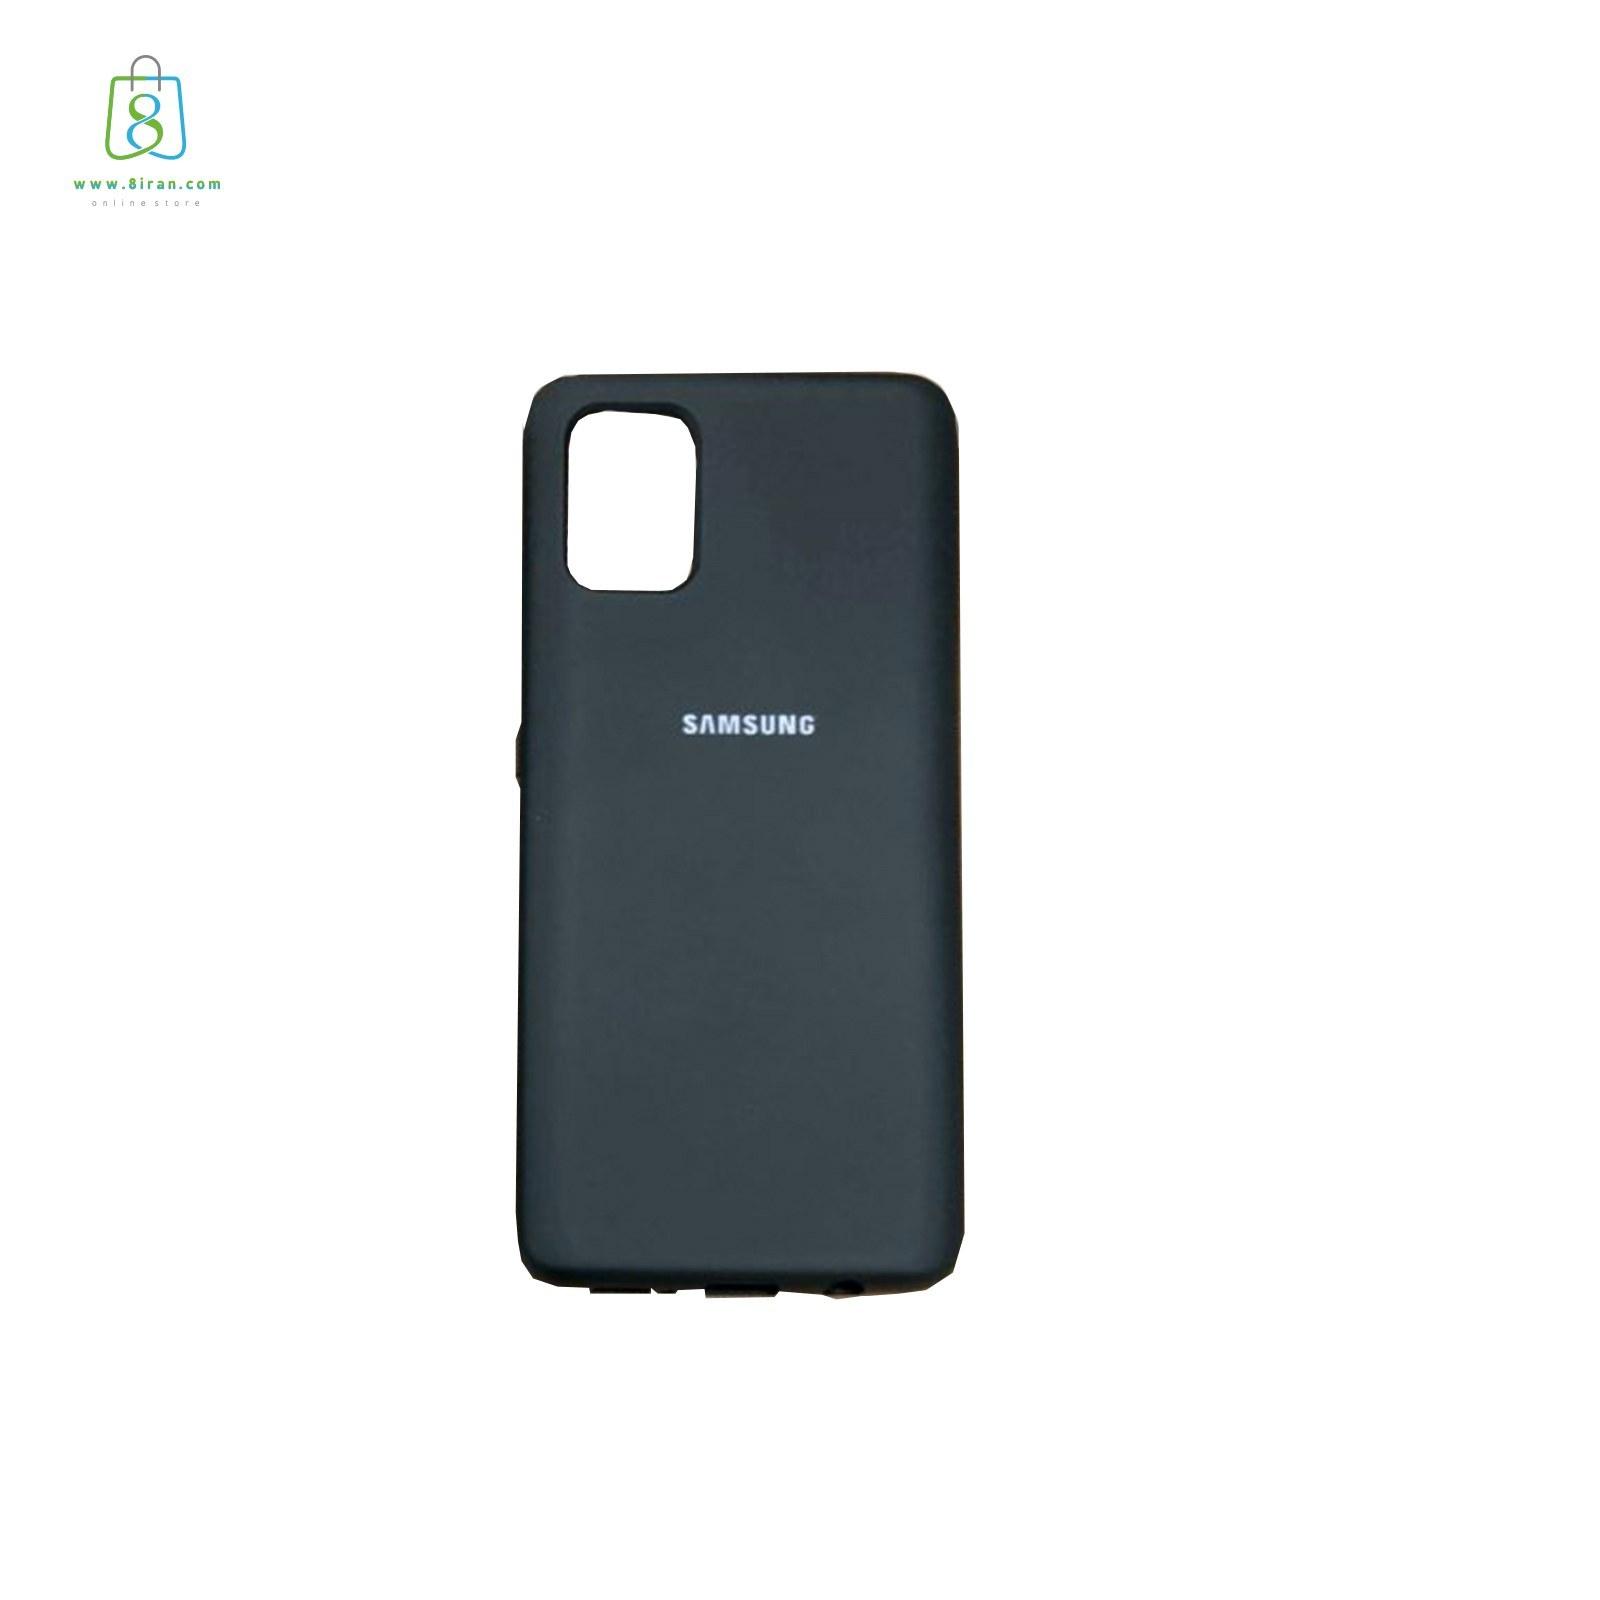 کاور سیلیکونی گوشی SAMSUNG مدل A51